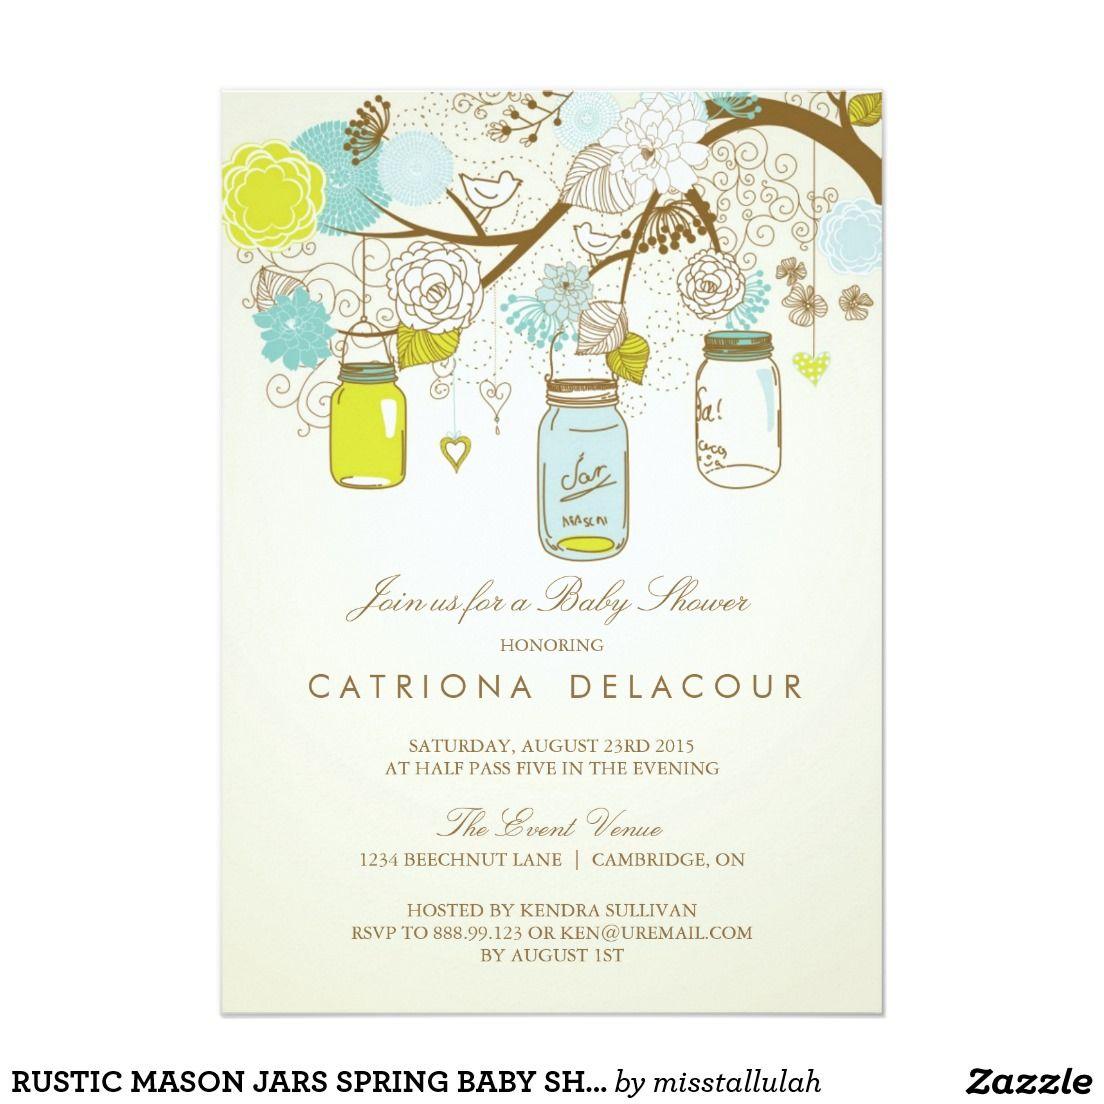 Rustic mason jars spring baby shower invitation   Shower invitations